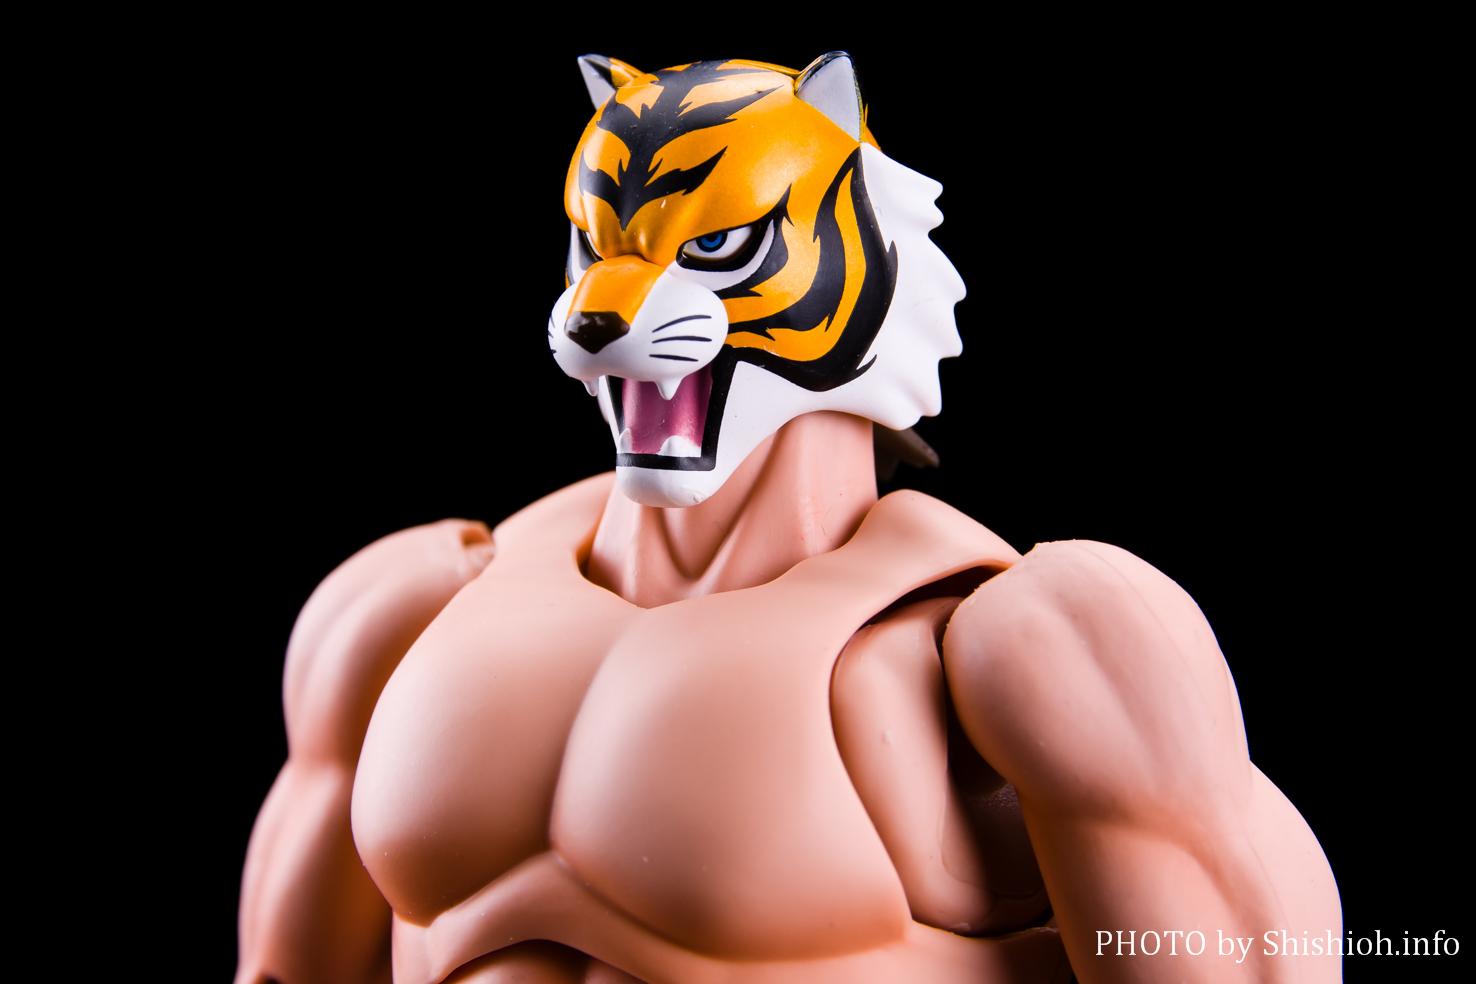 S.H.Figuarts タイガーマスク